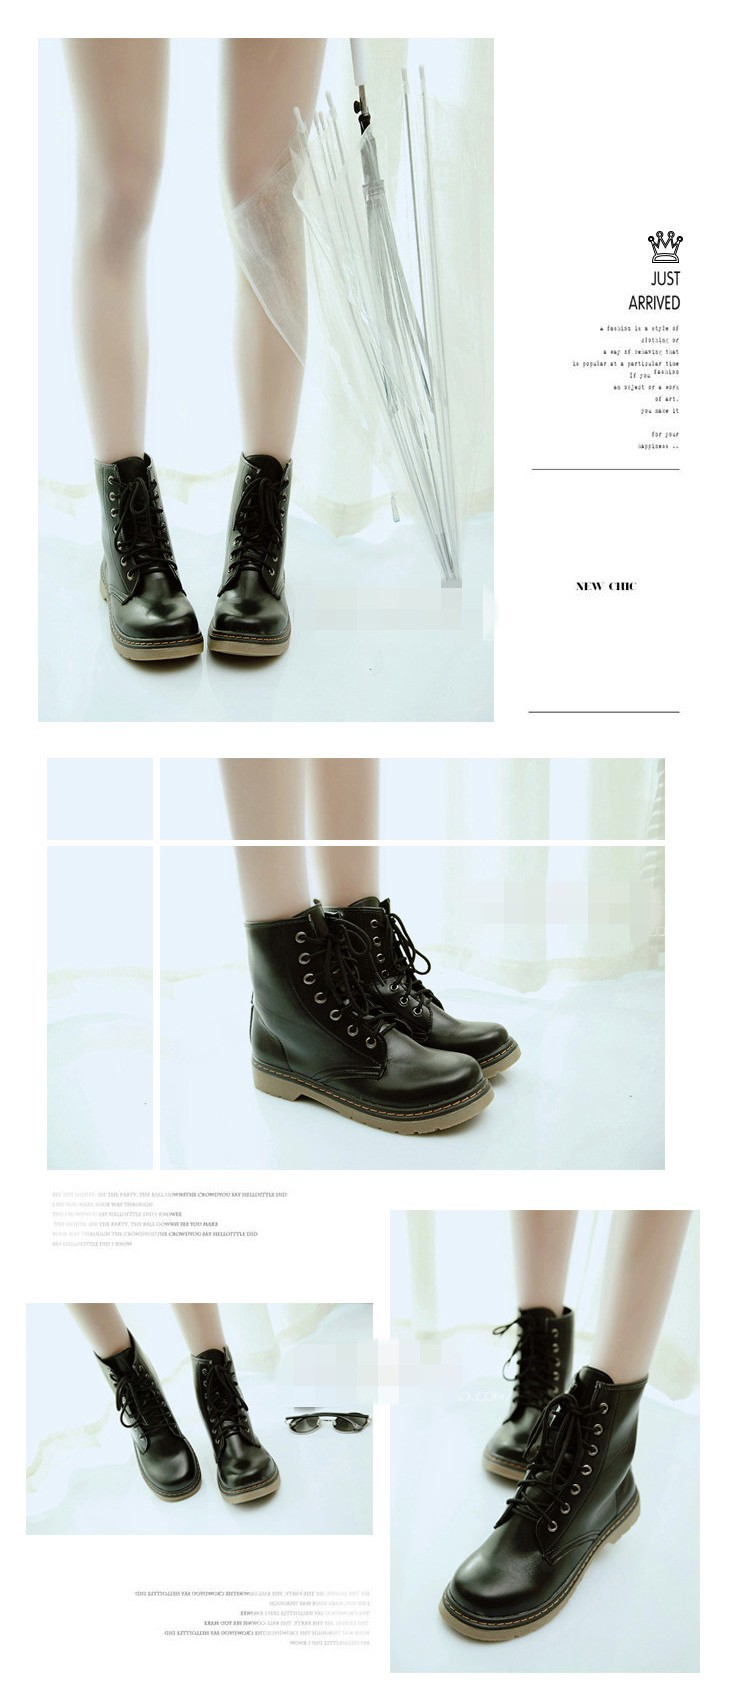 rebelsmarket_punk_boots_botas_punk_wh0097_boots_6.jpg